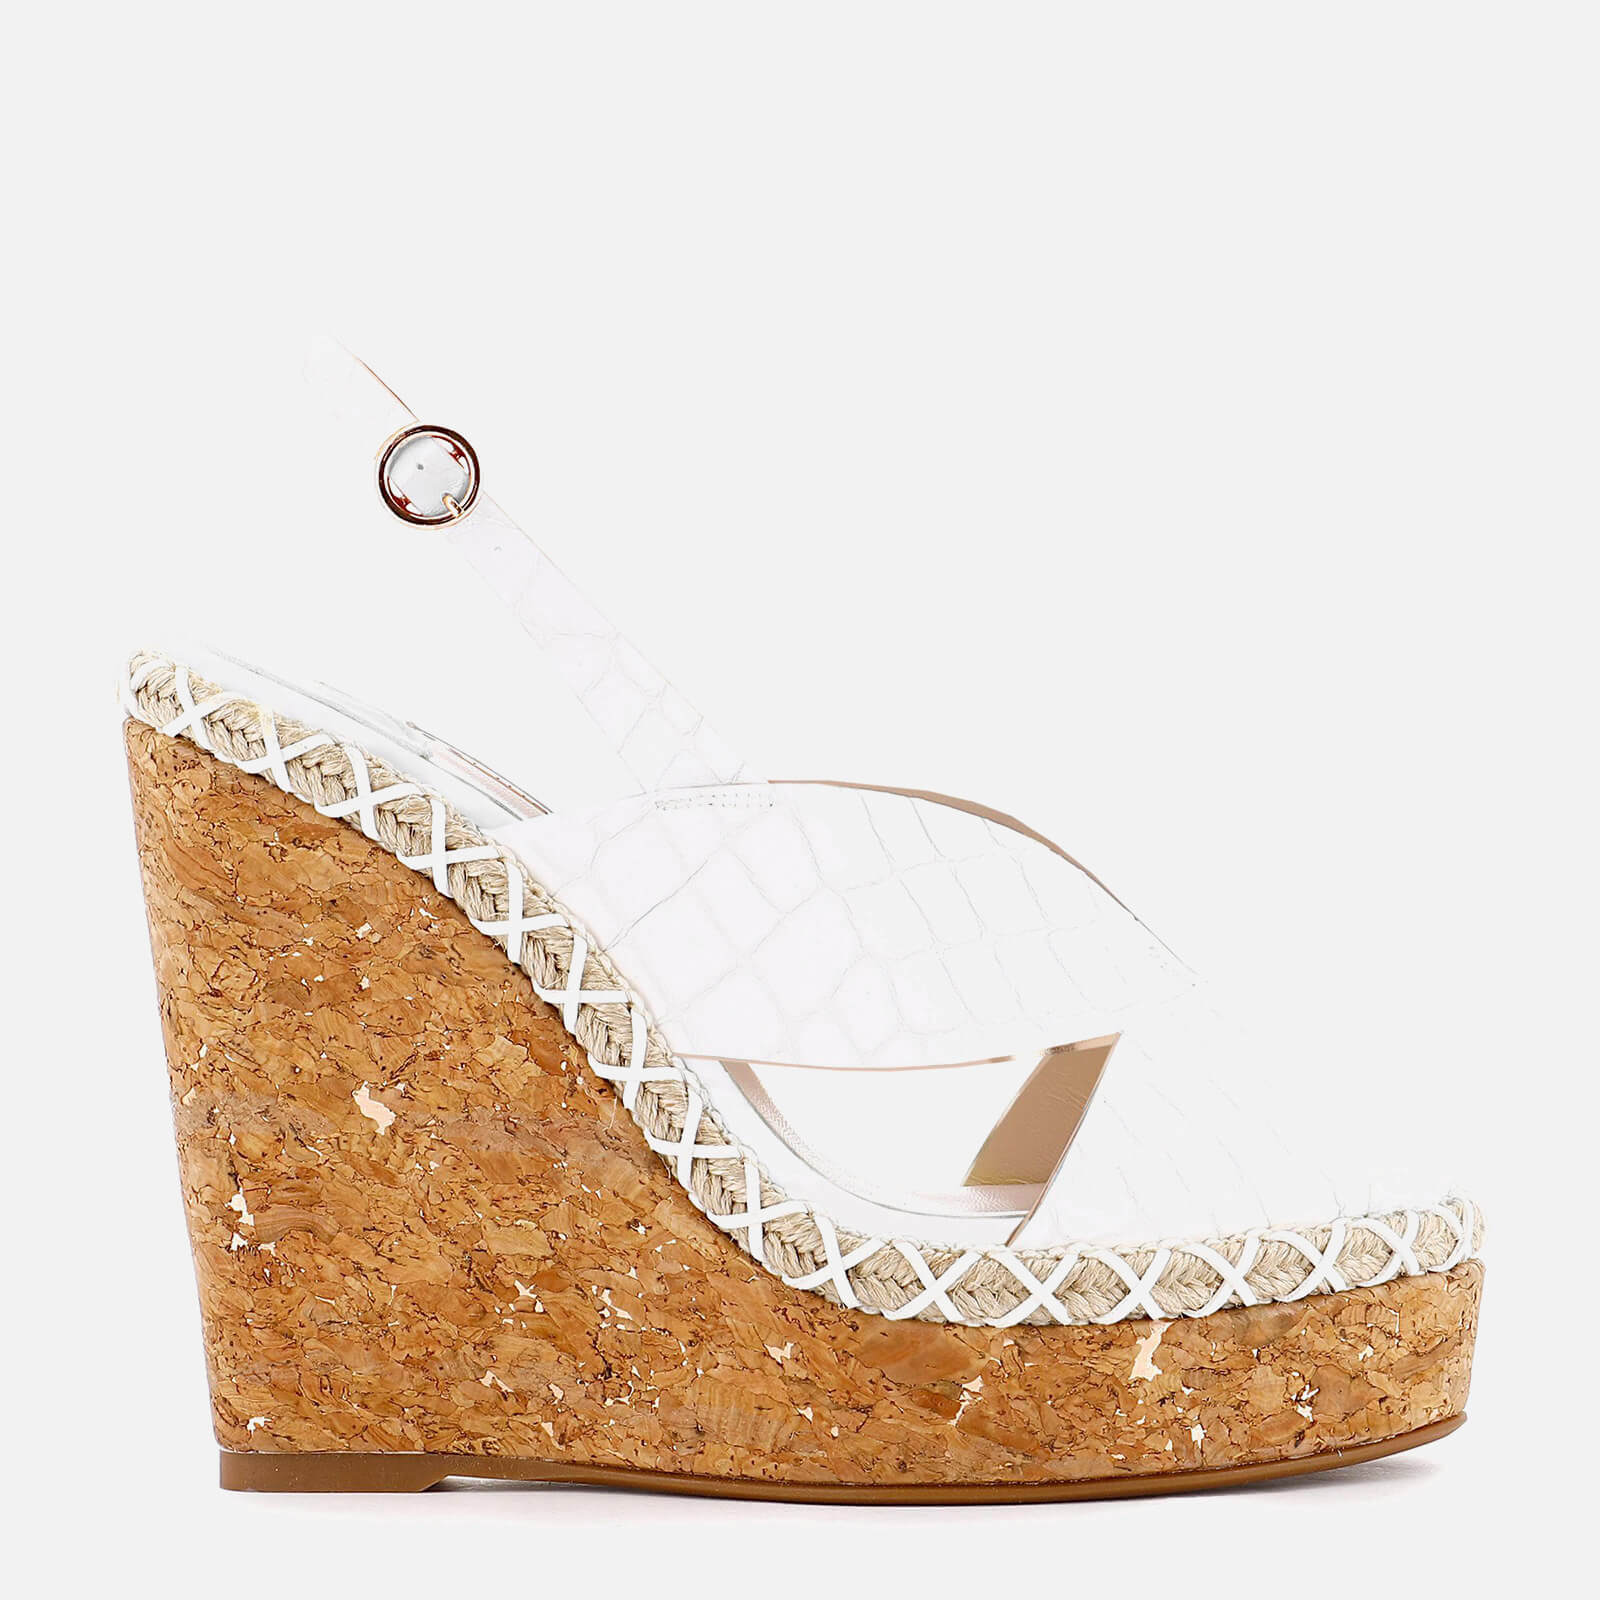 Sophia Webster Women's Rita Croc Wedged Sandals - White